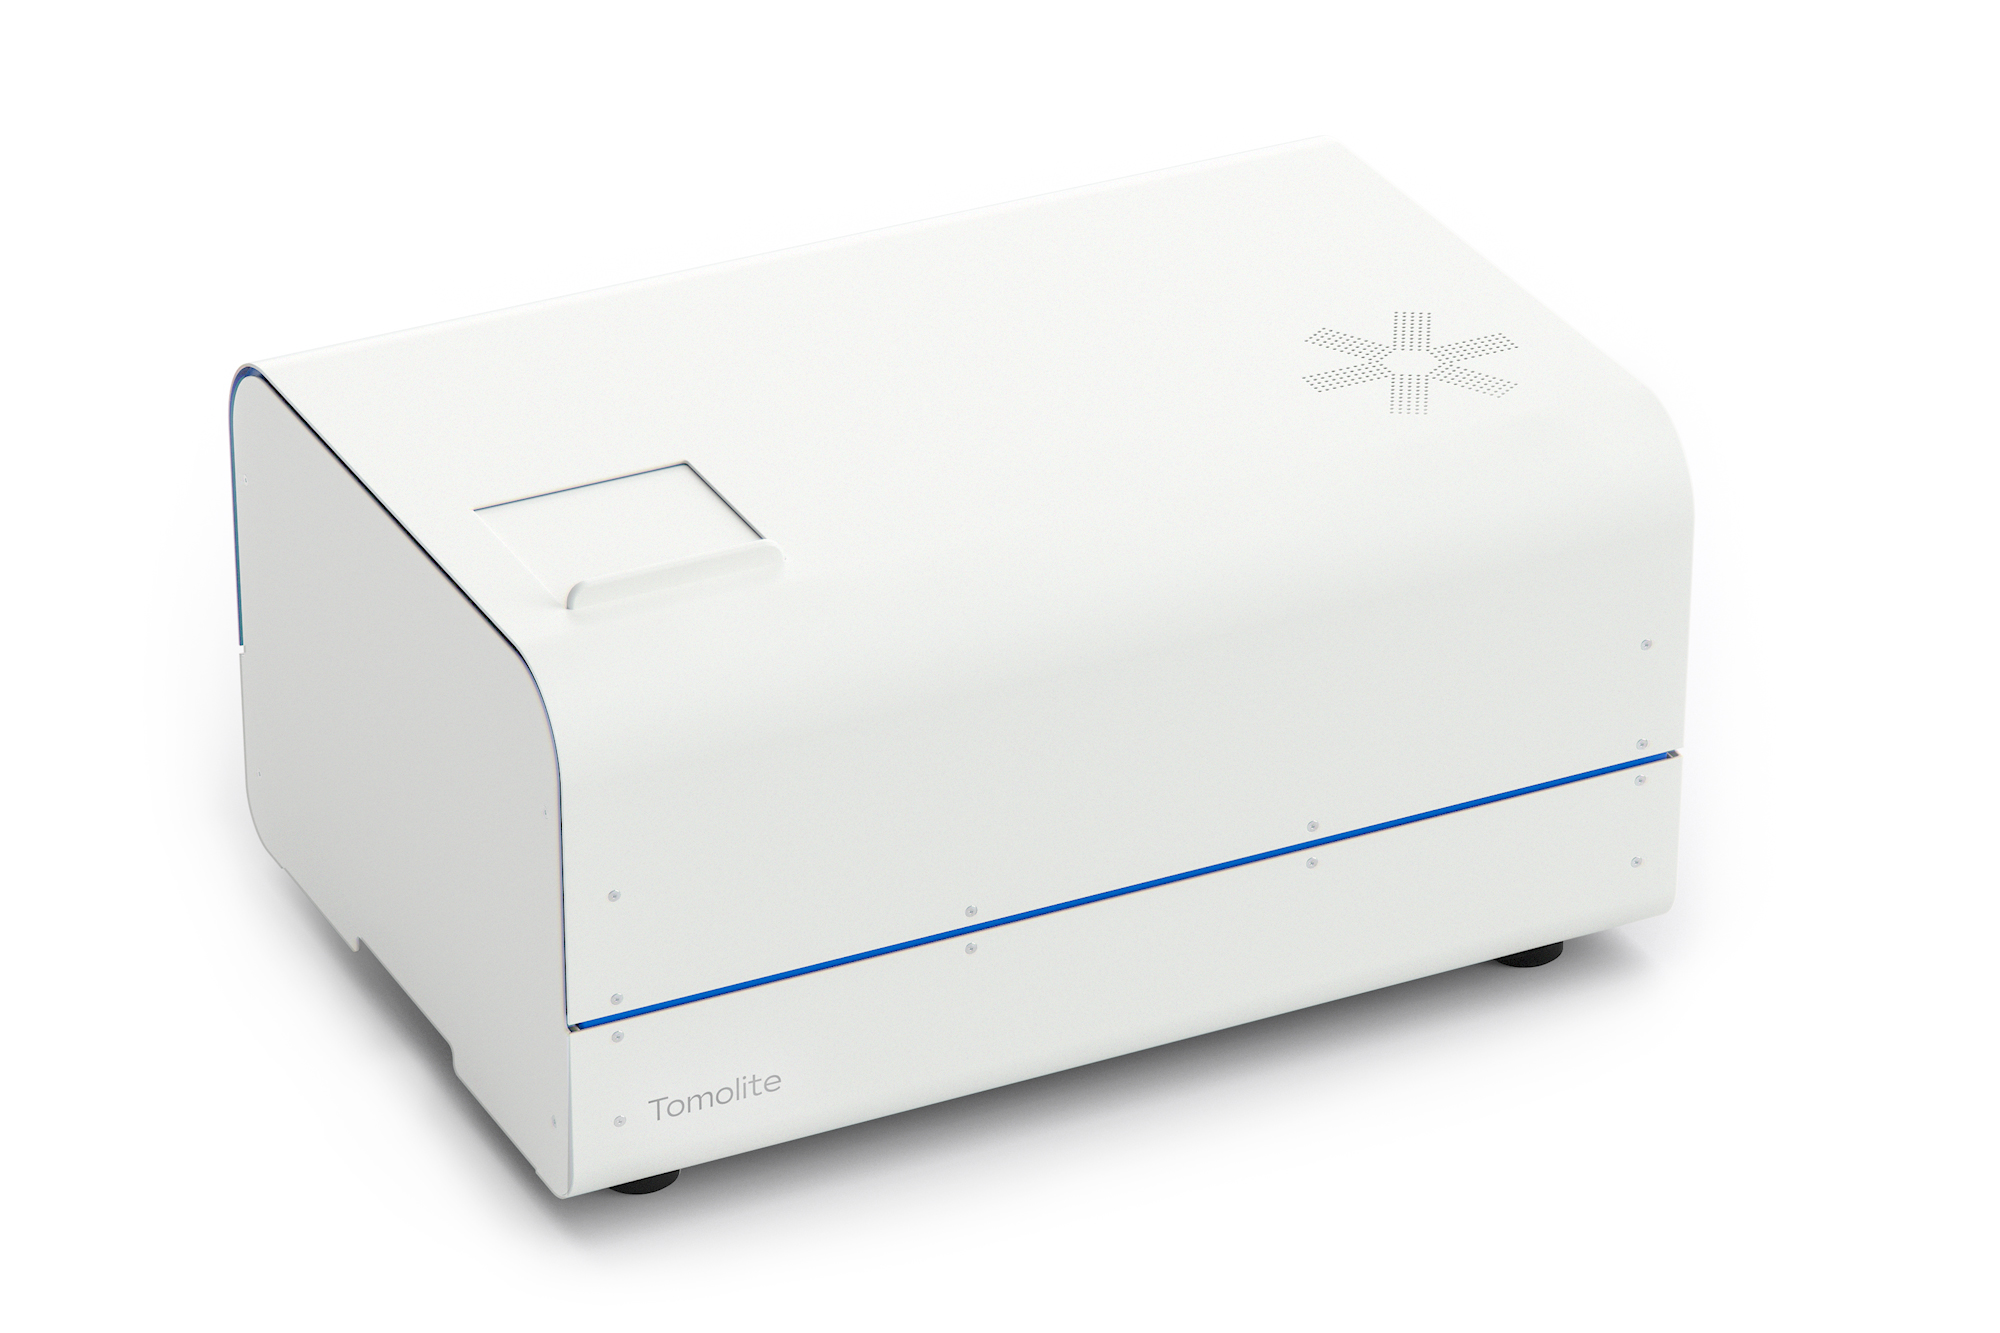 Readily3D's Tomolite 3D bioprinter. Photo via Readily3D.